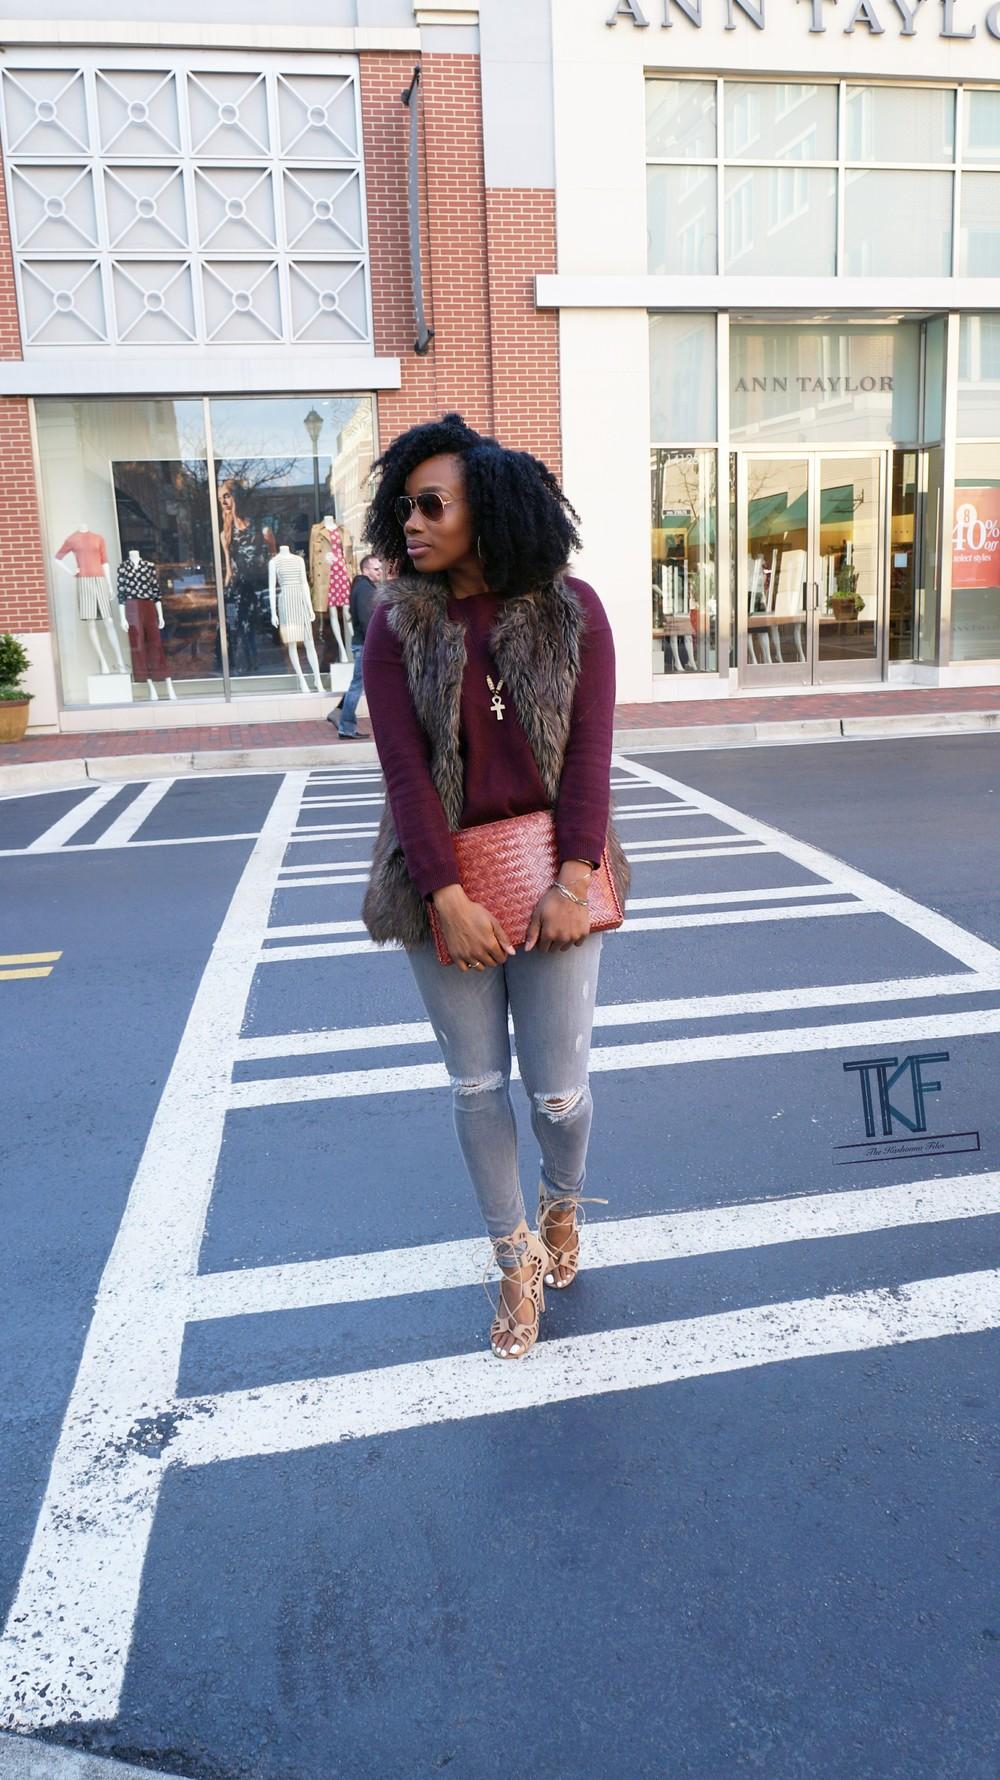 fashionista-walking-down-the-street.jpg